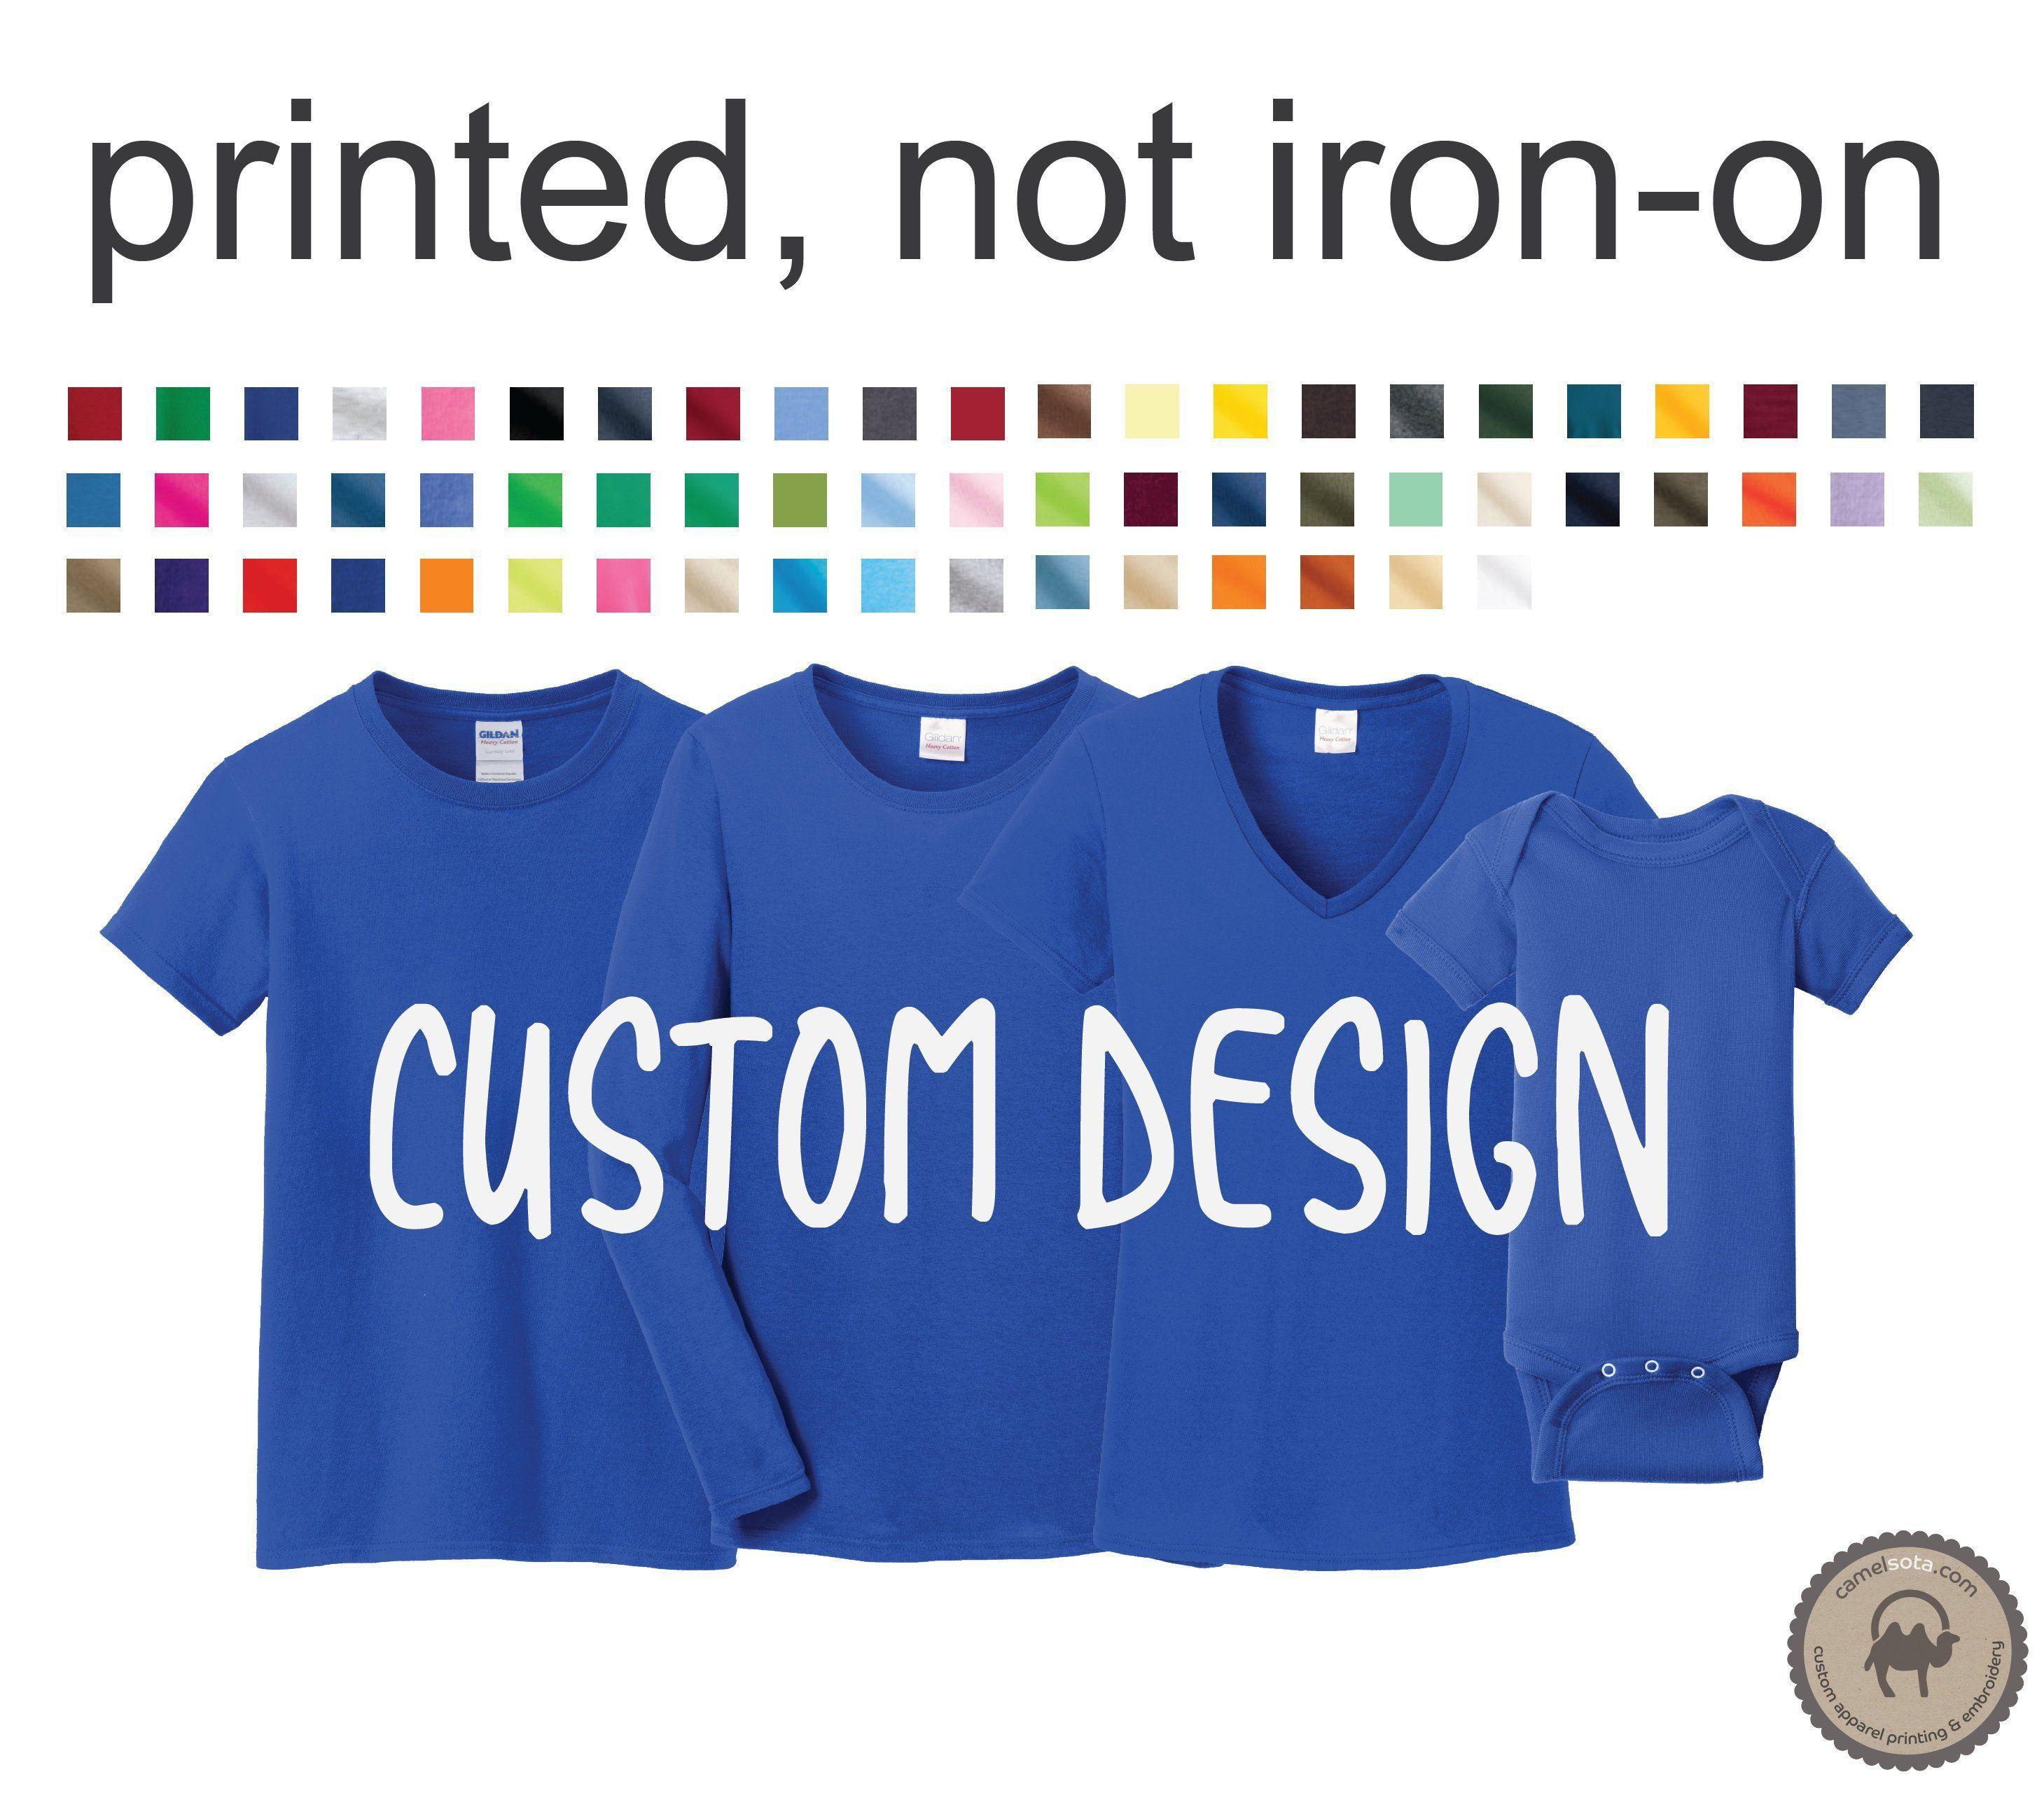 f7f3b1ba2 District Perfect Weight Shirts, Custom Printed Shirts, Family Reunion Shirts,  Group Matching Shirts, Family Matching Shirts, Family Shirts